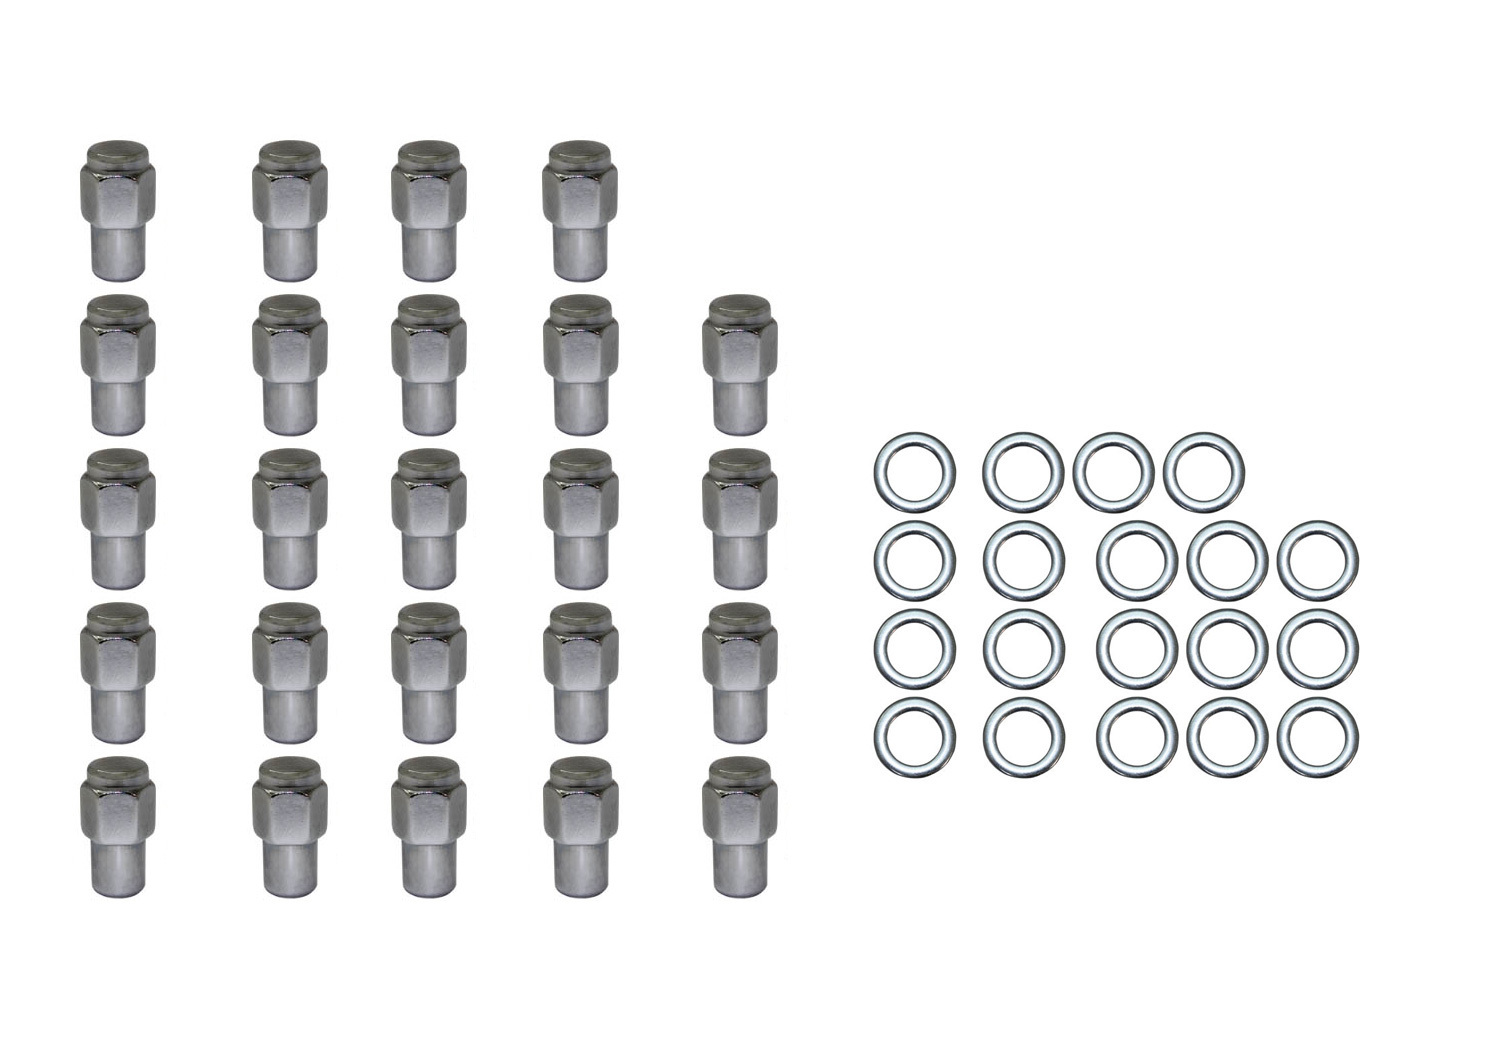 24 Pc Set Chrome Steel Mag Shank Lug Nuts 12mm X 1 5 For